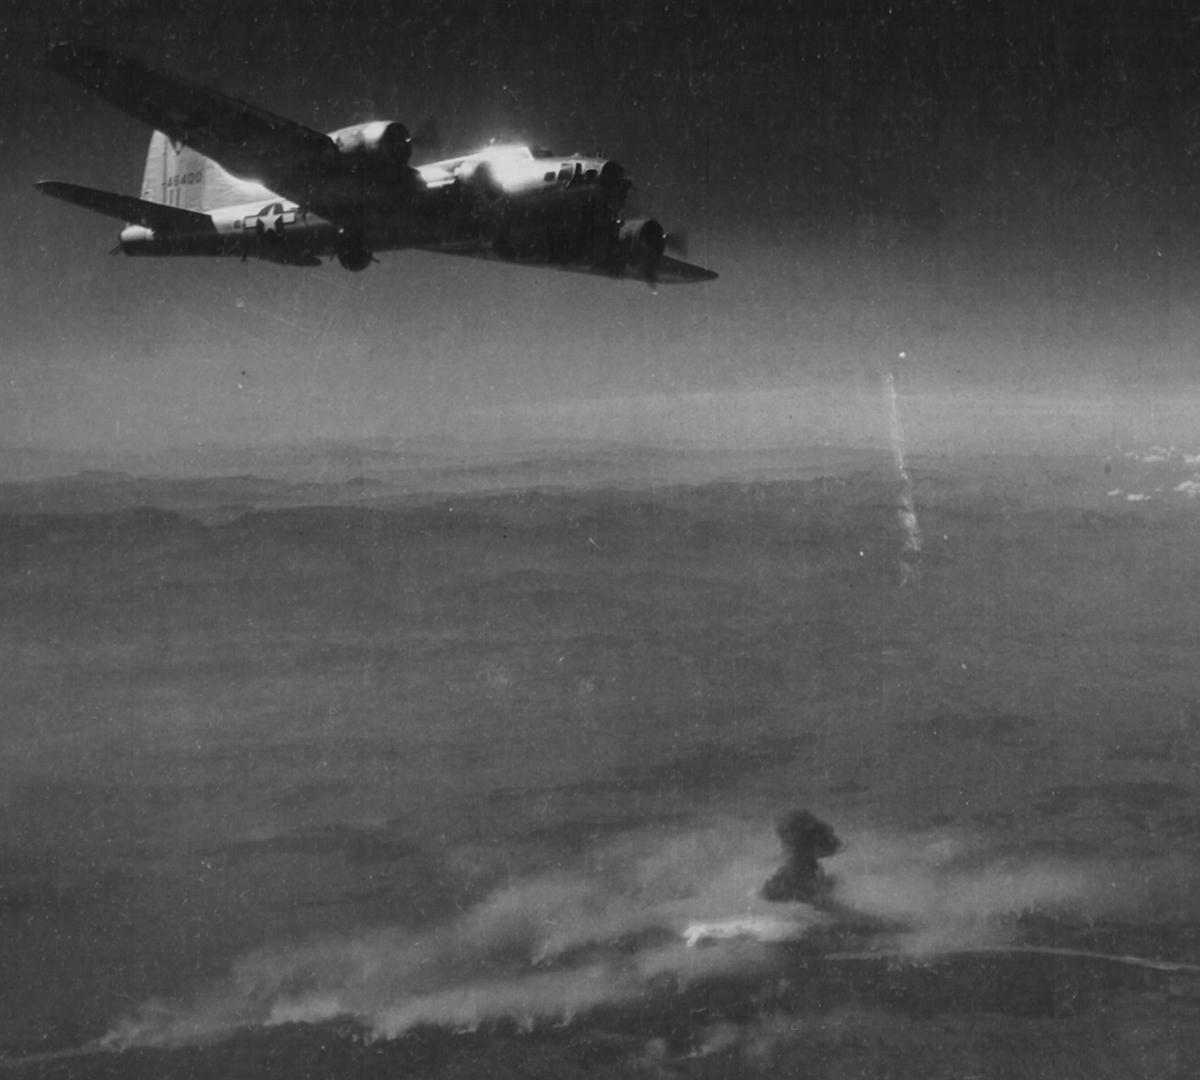 B-17 #44-6400